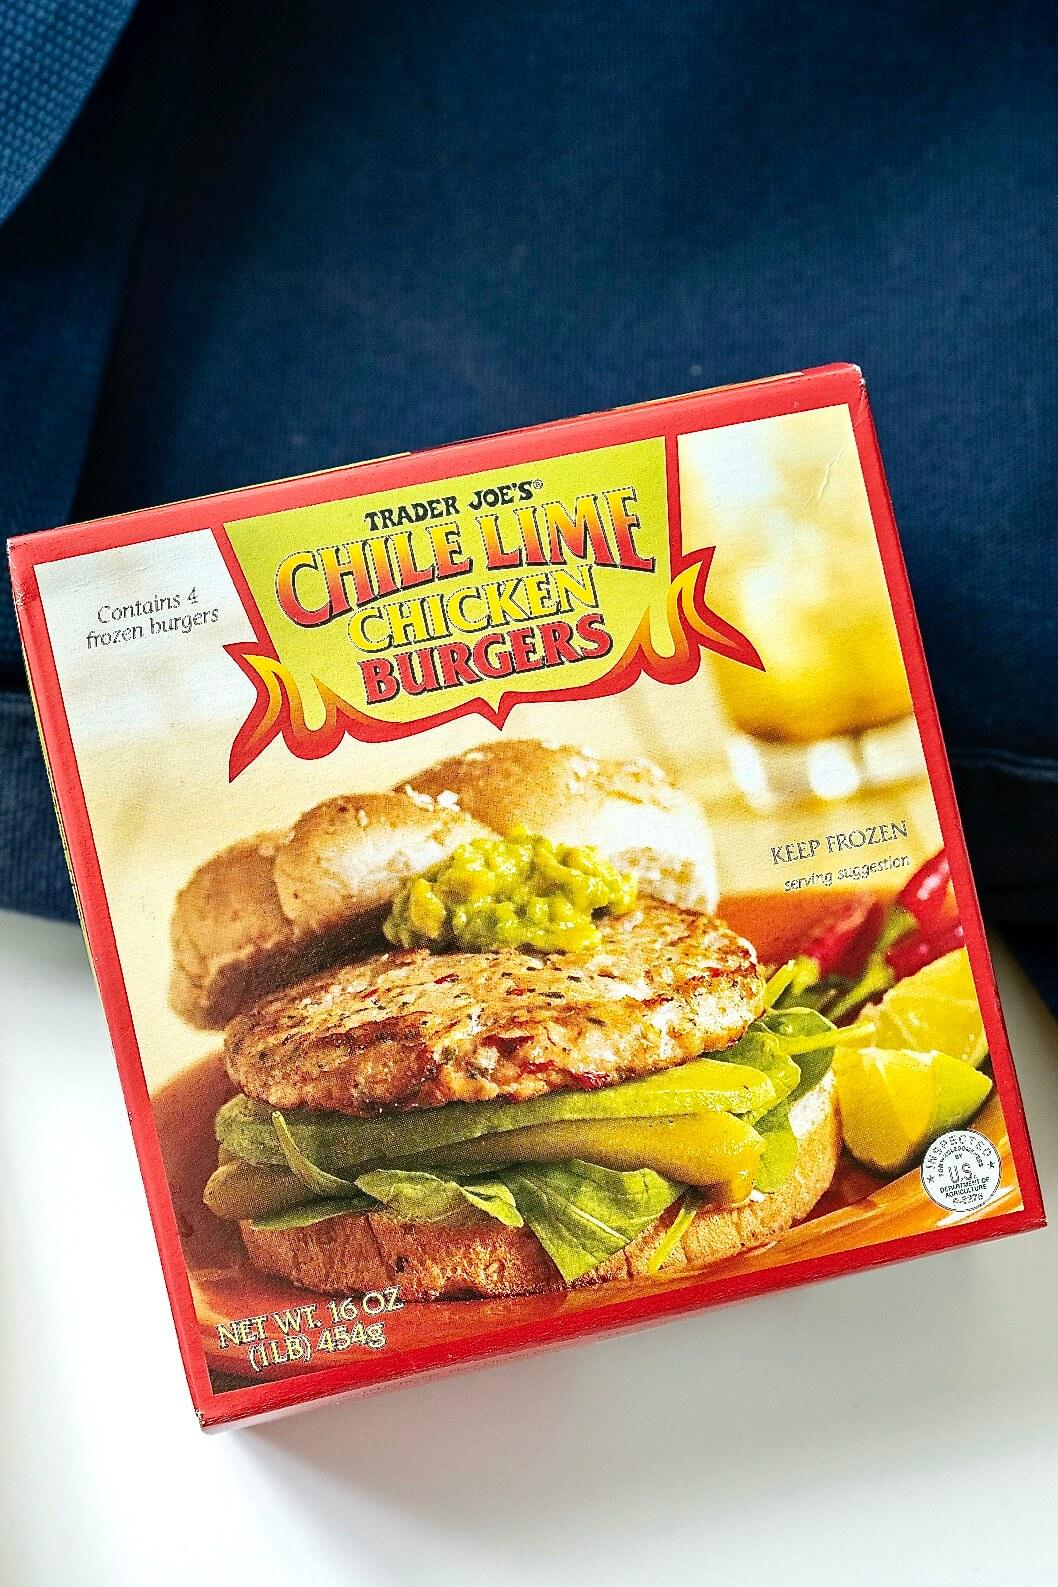 Trader Joe's Chili Lime Burgers